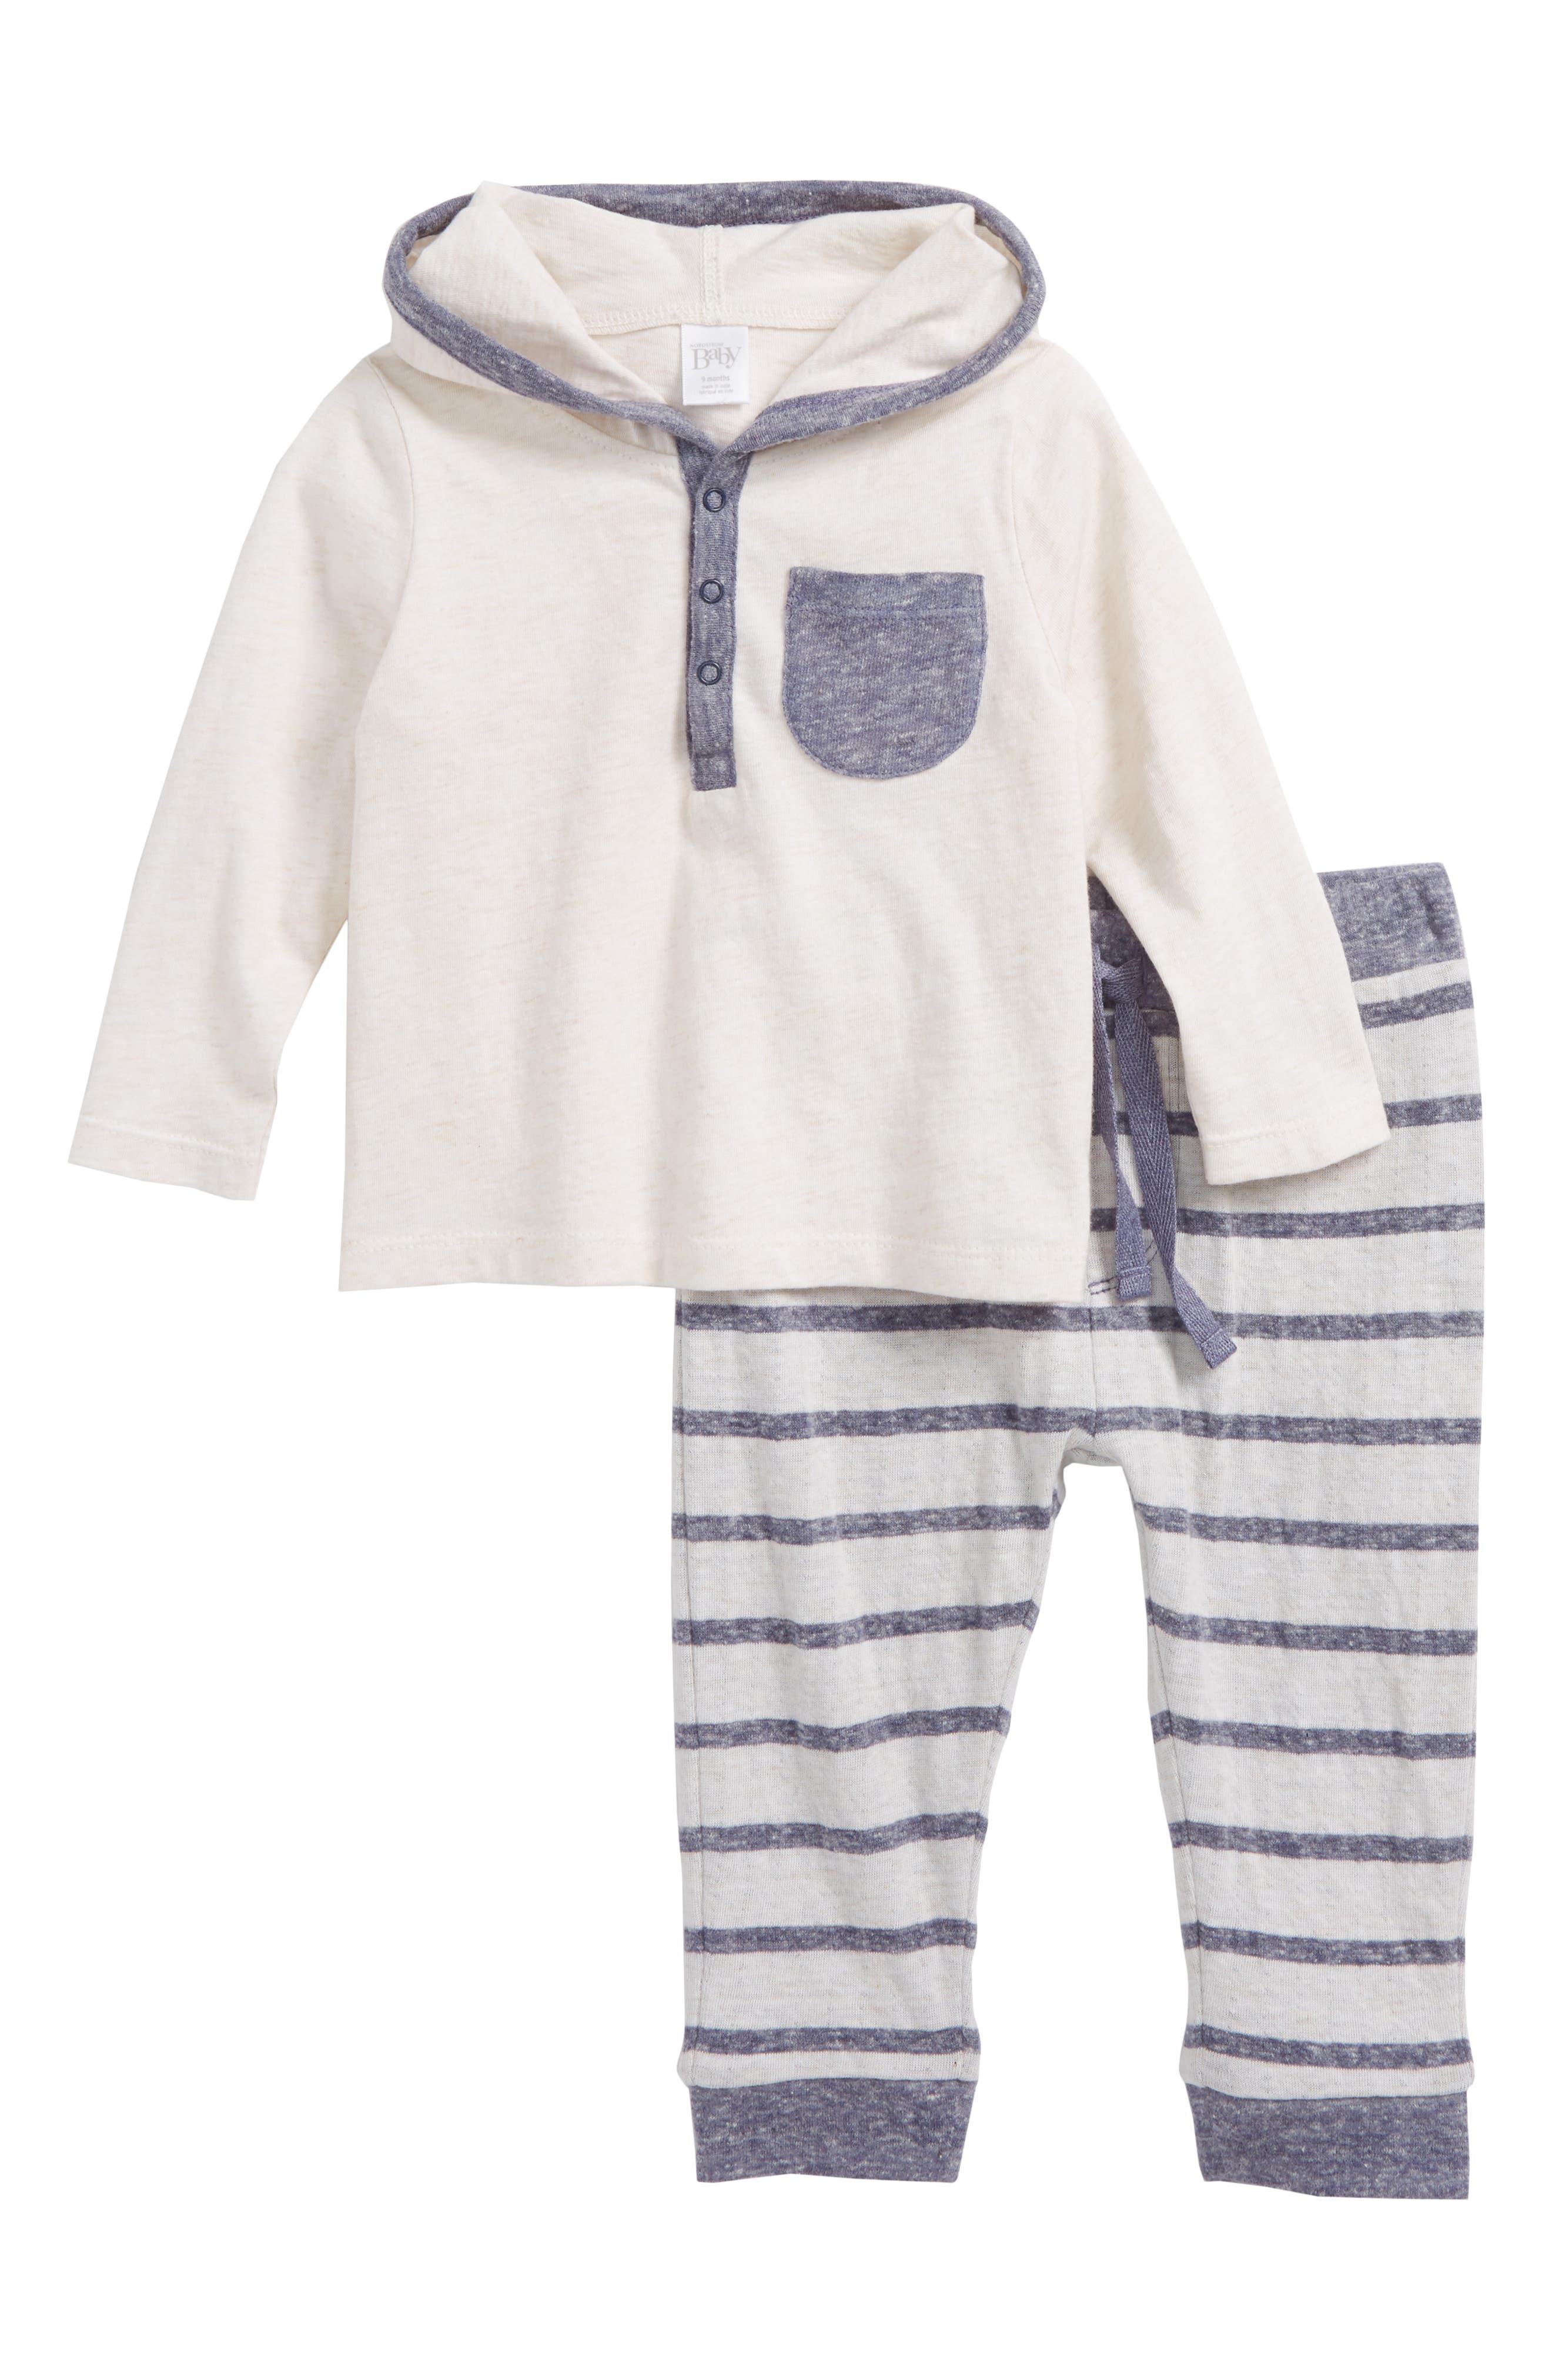 NORDSTROM BABY,                             Hooded Henley T-Shirt & Stripe Pants Set,                             Main thumbnail 1, color,                             900